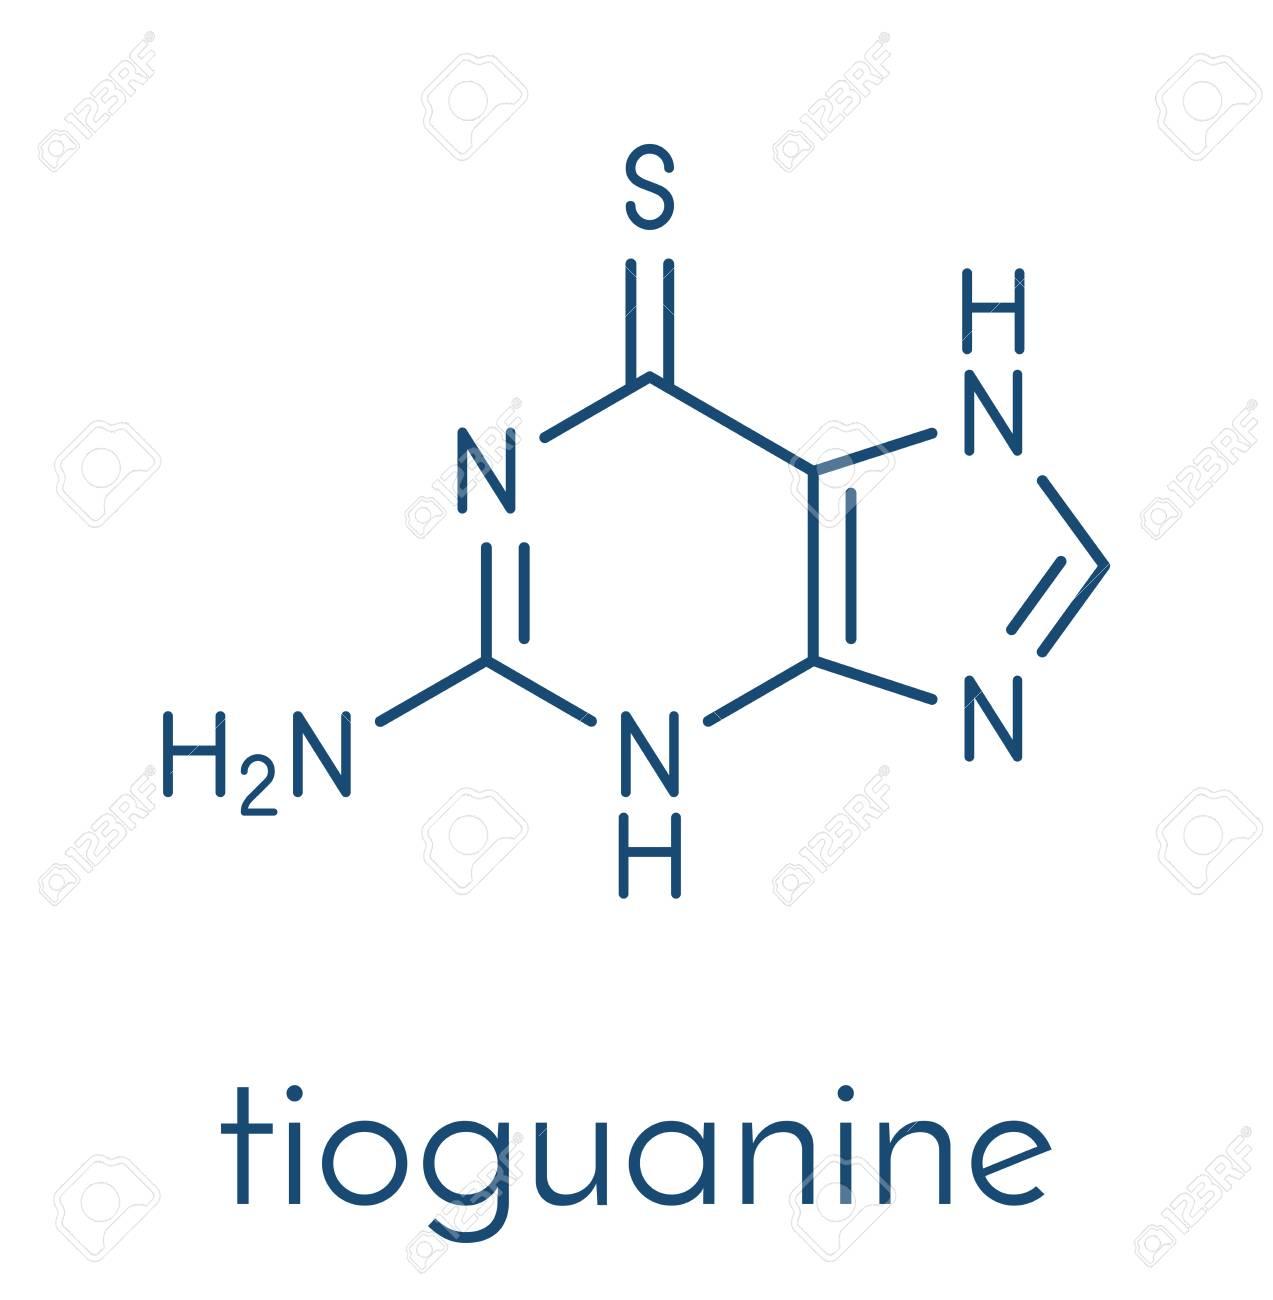 hight resolution of tioguanine leukemia and ulcerative colitis drug molecule skeletal formula stock vector 91297712